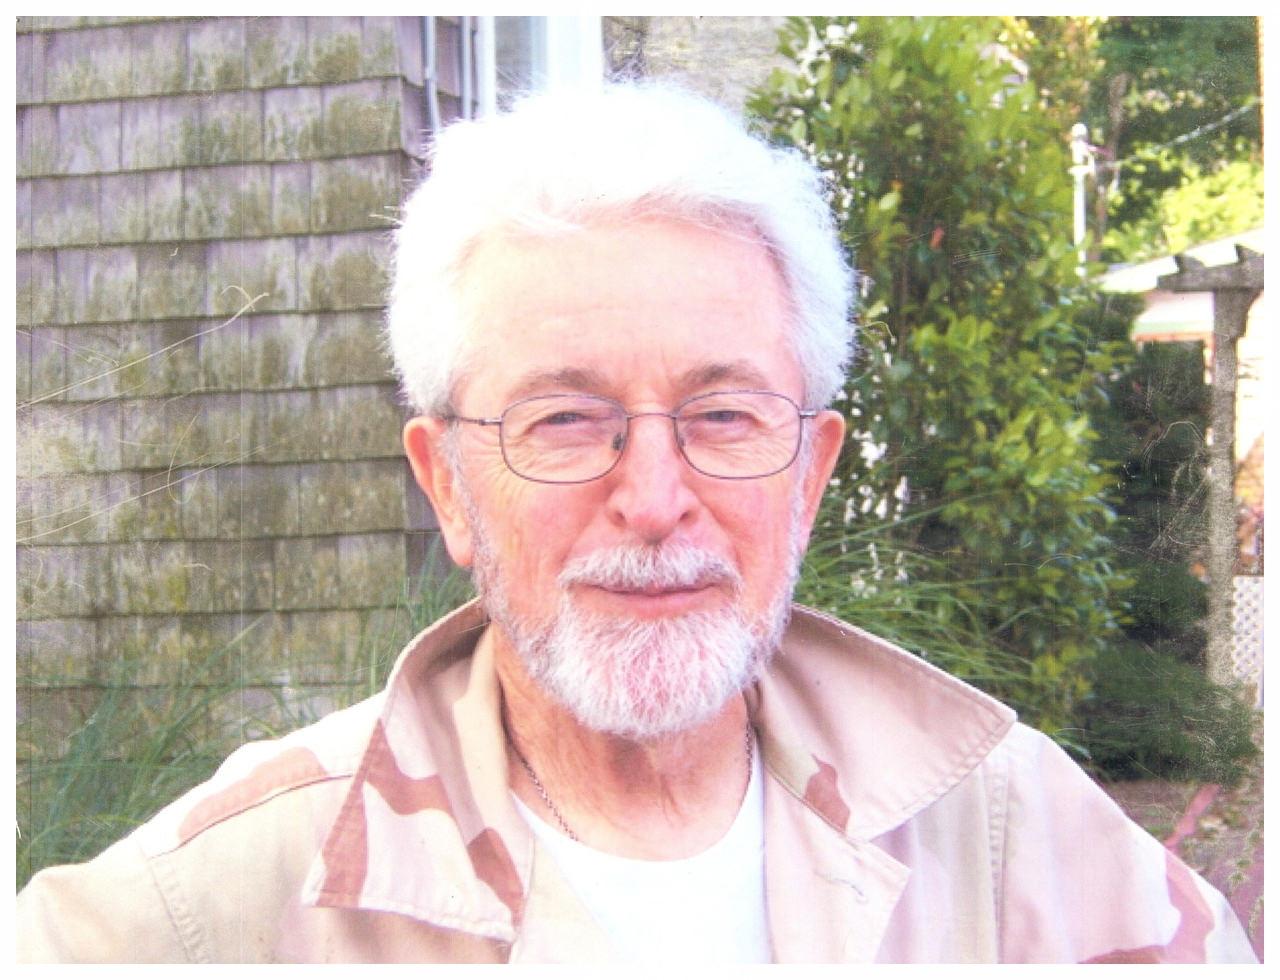 John McIntyre 001 (2)_mini.jpg